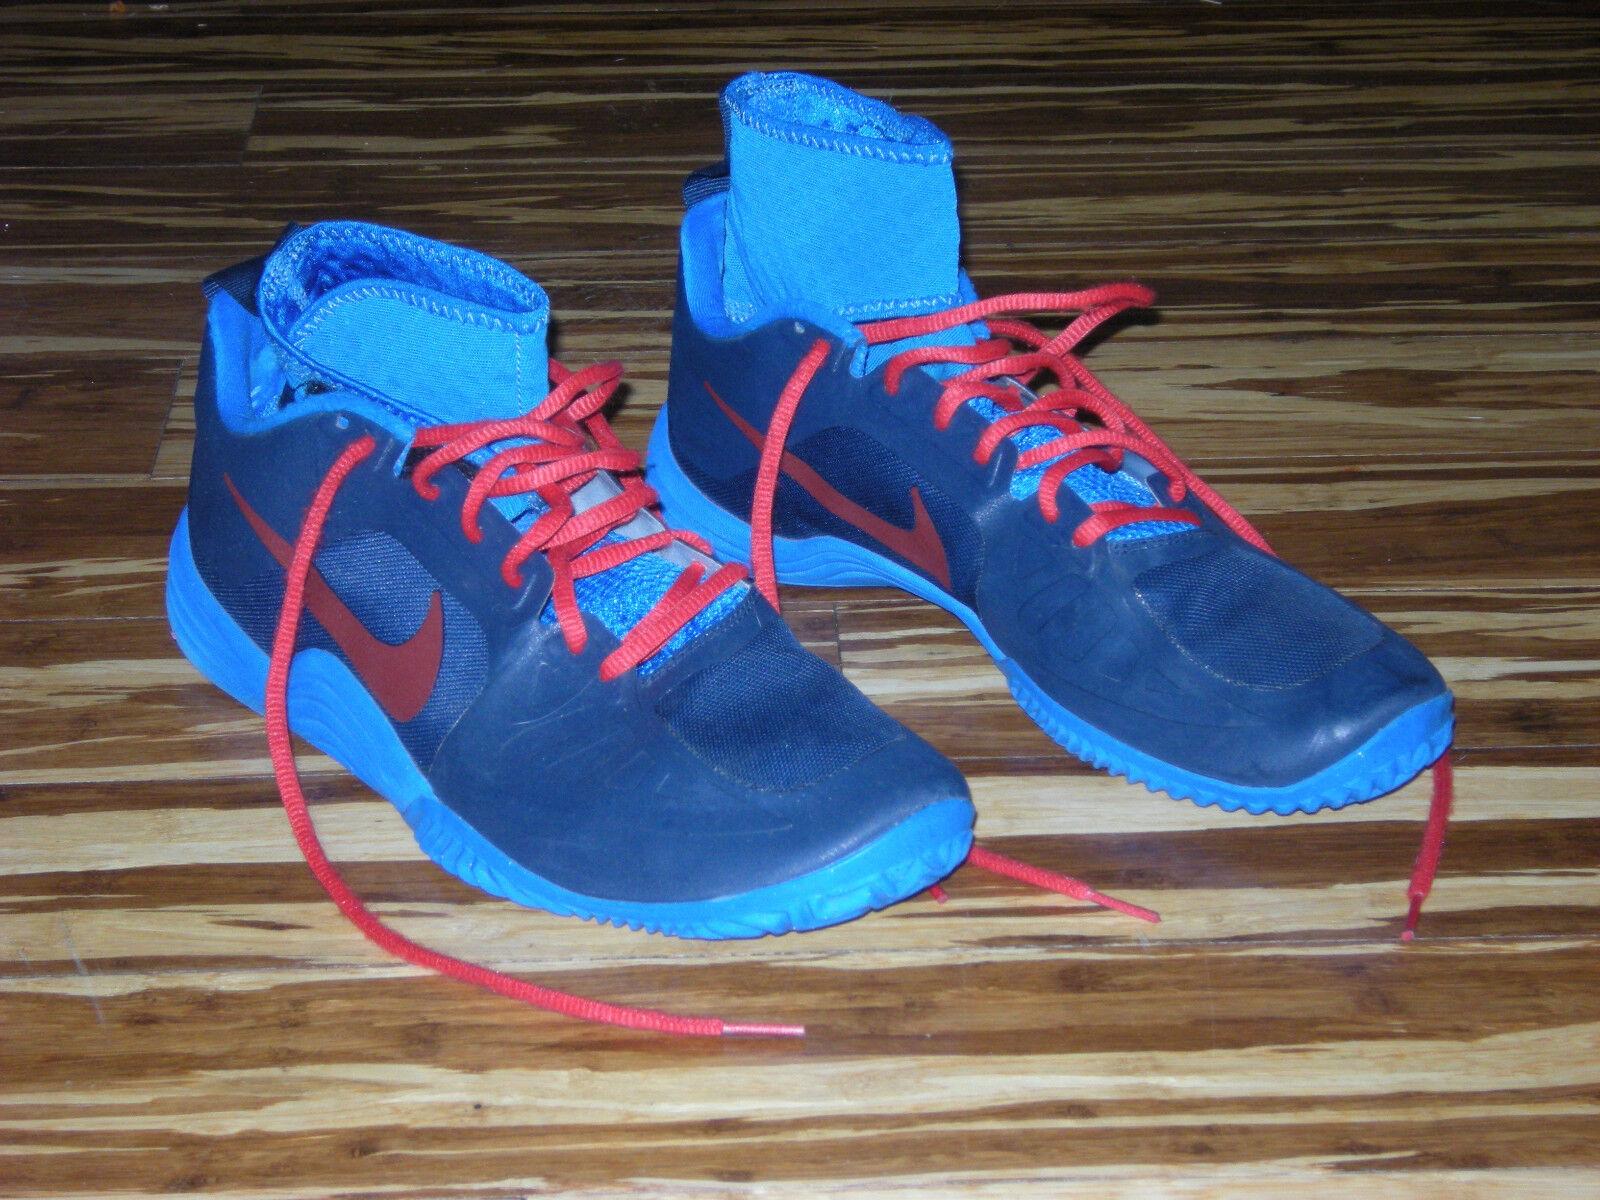 2018 Nike AIR LUNAR KD movimiento BB muestra 9.5 KD LUNAR baloncesto correr trainer Rojo Azul 80508c